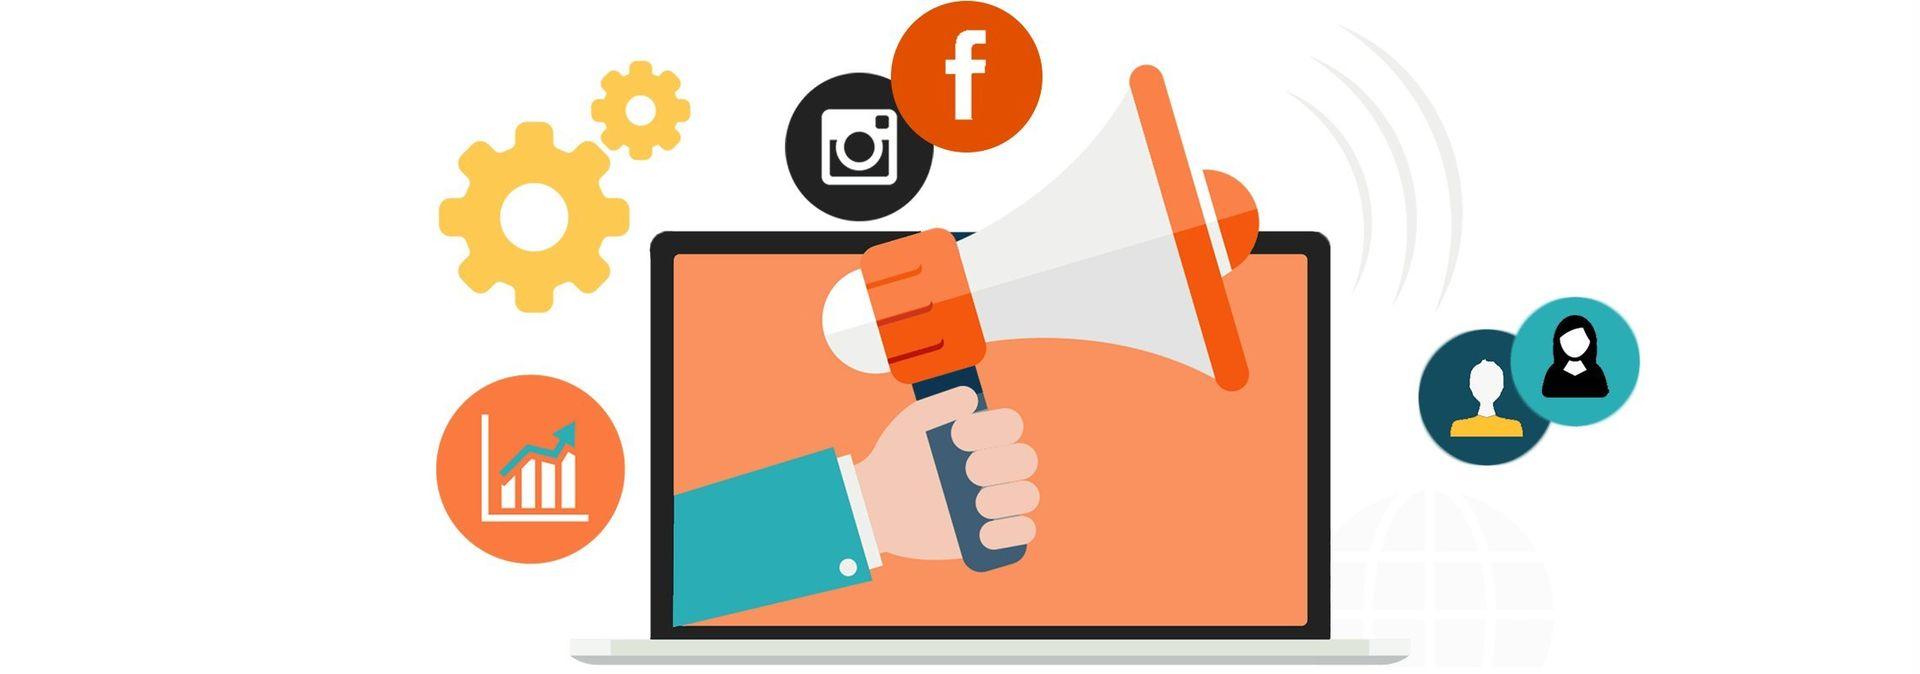 merakhi-labs-web-slide-digital-marketing